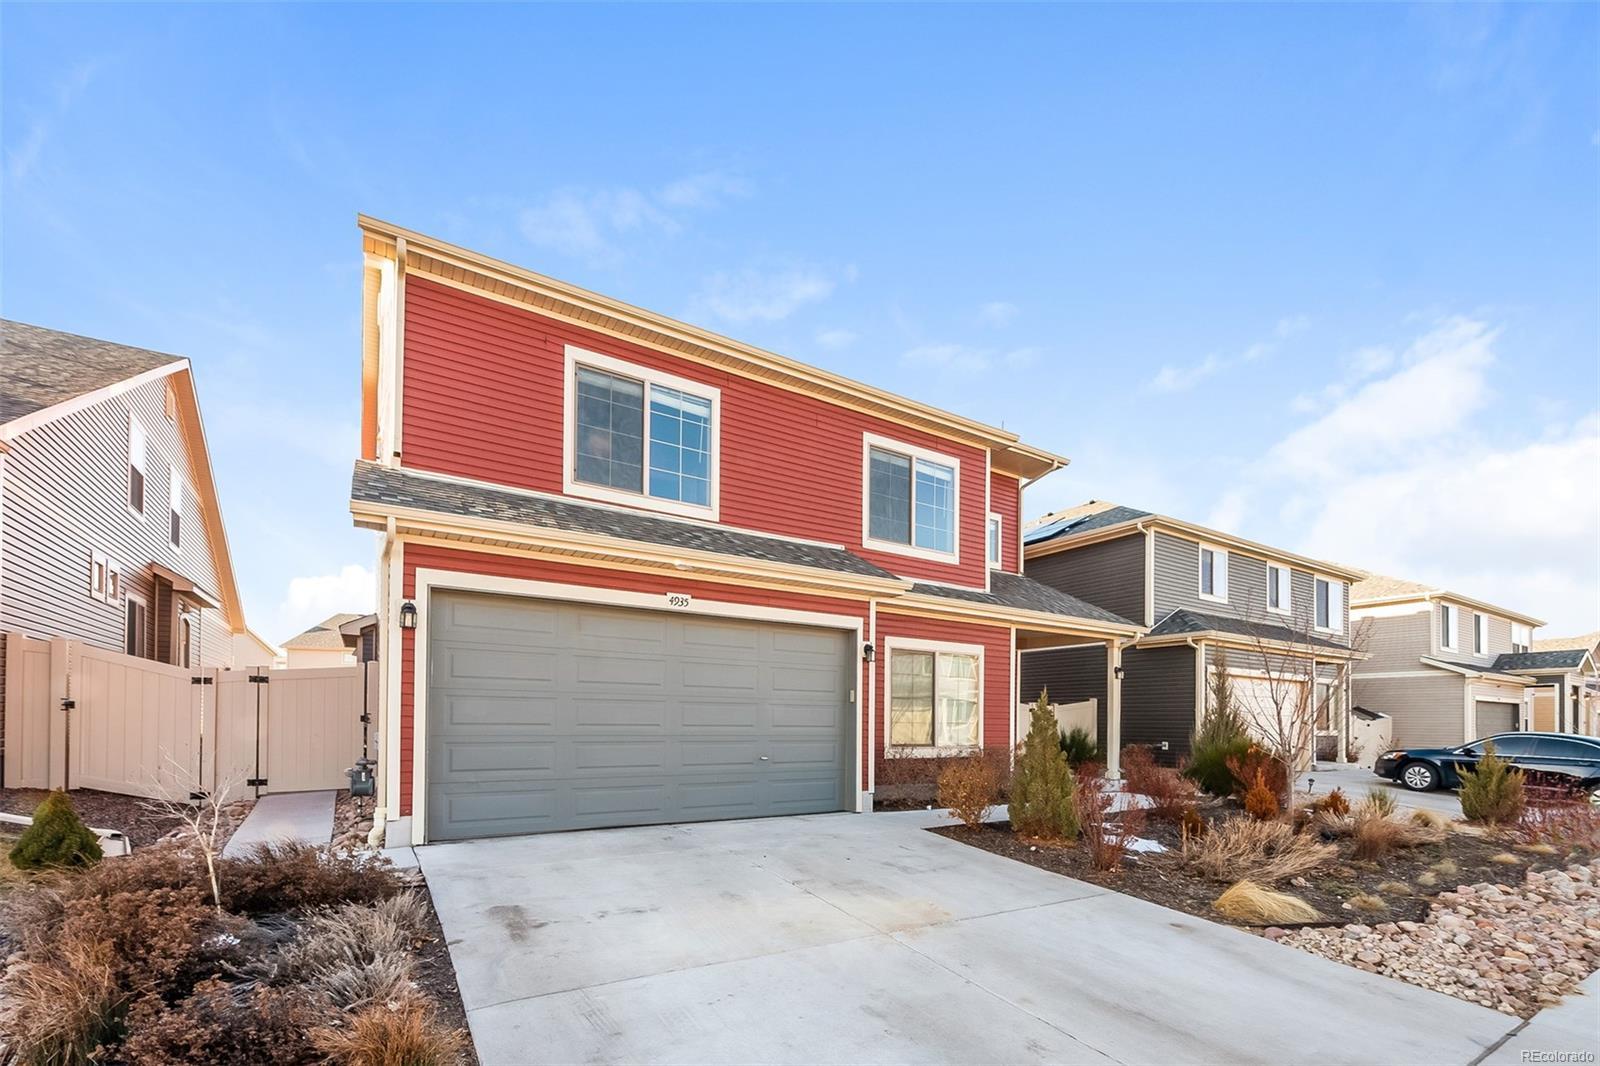 4935 Ceylon Way, Denver, CO 80249 - Denver, CO real estate listing